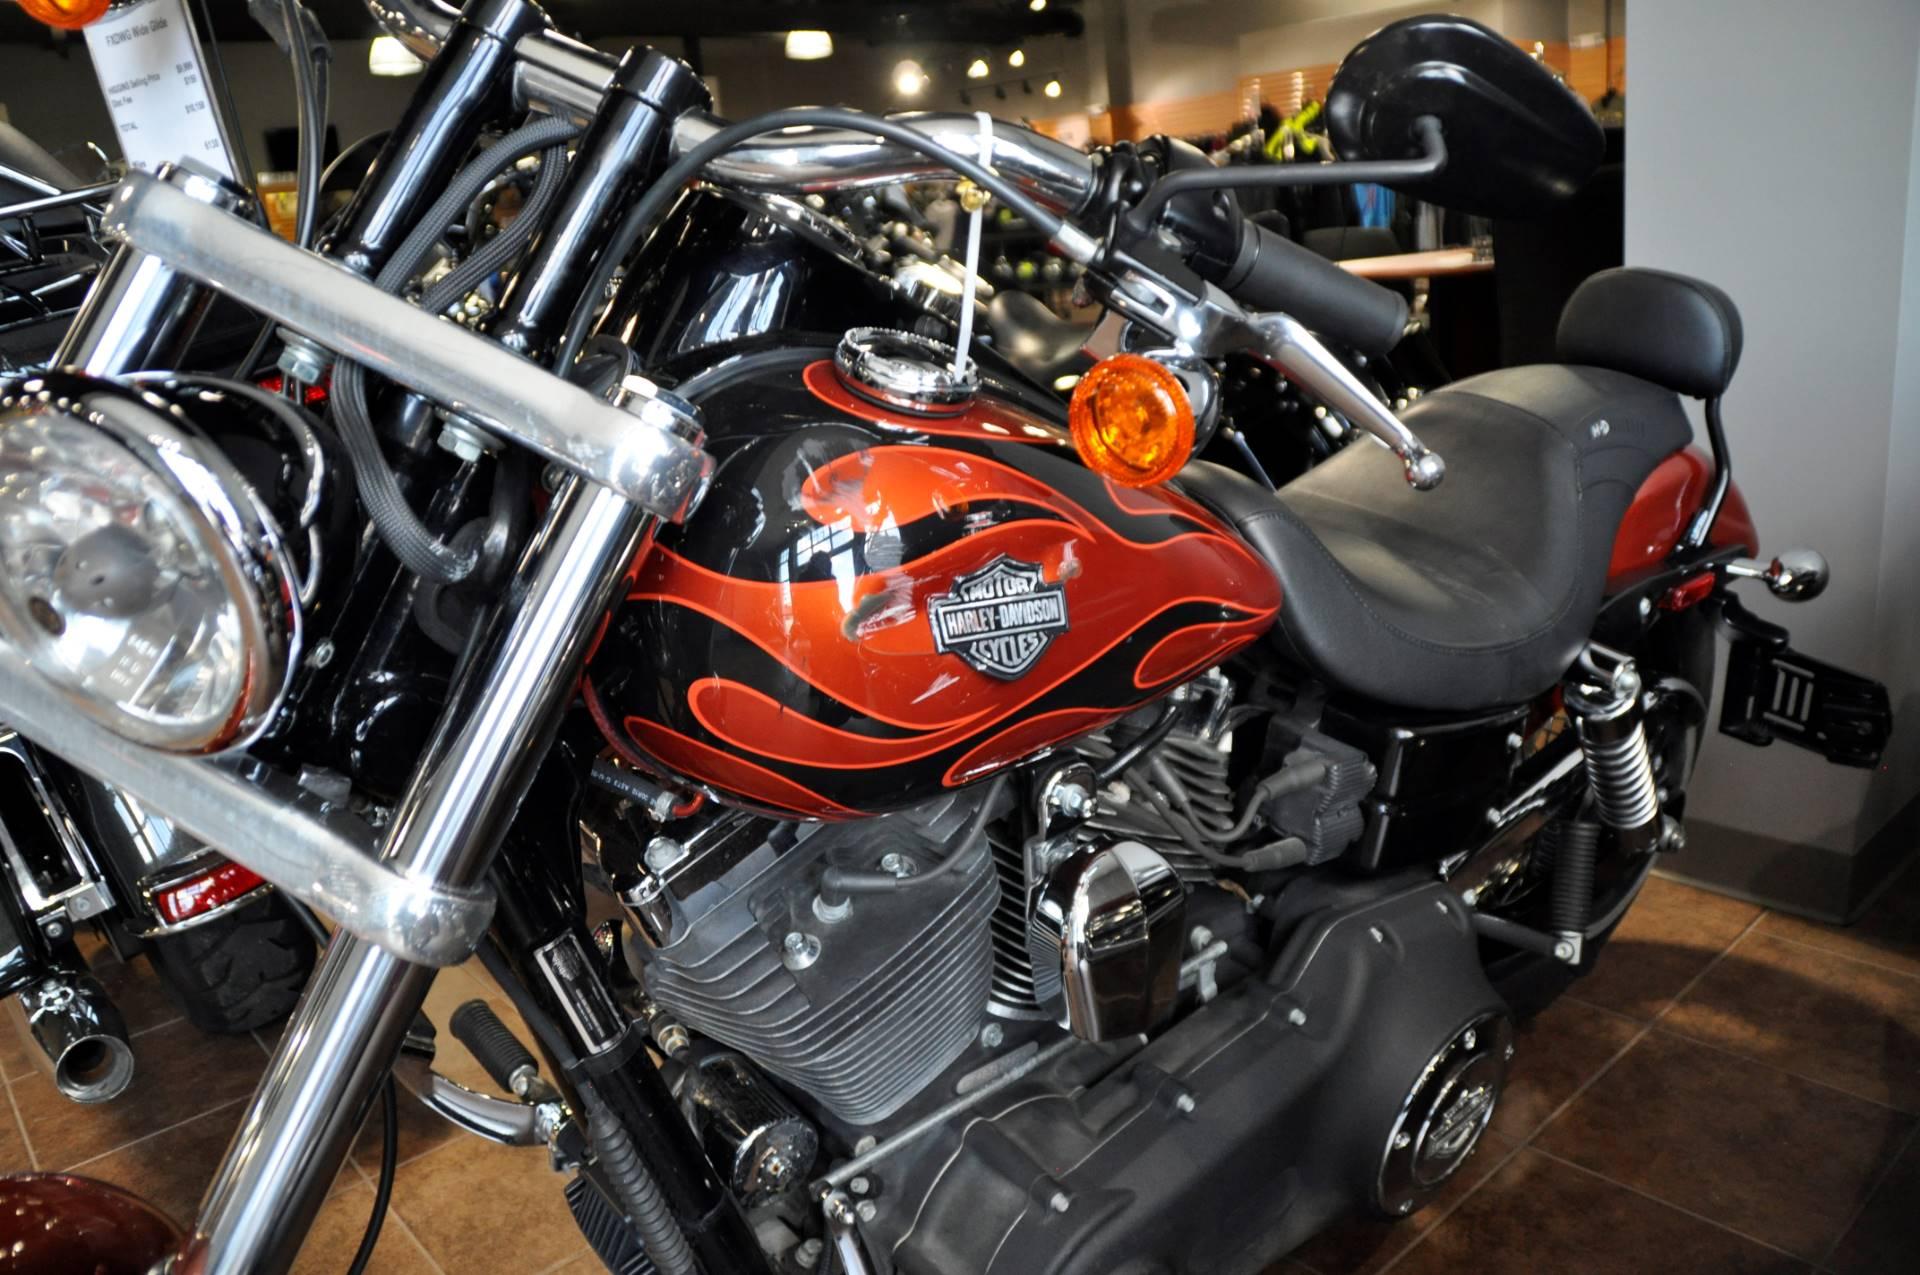 2011 Harley-Davidson Dyna Wide Glide 4